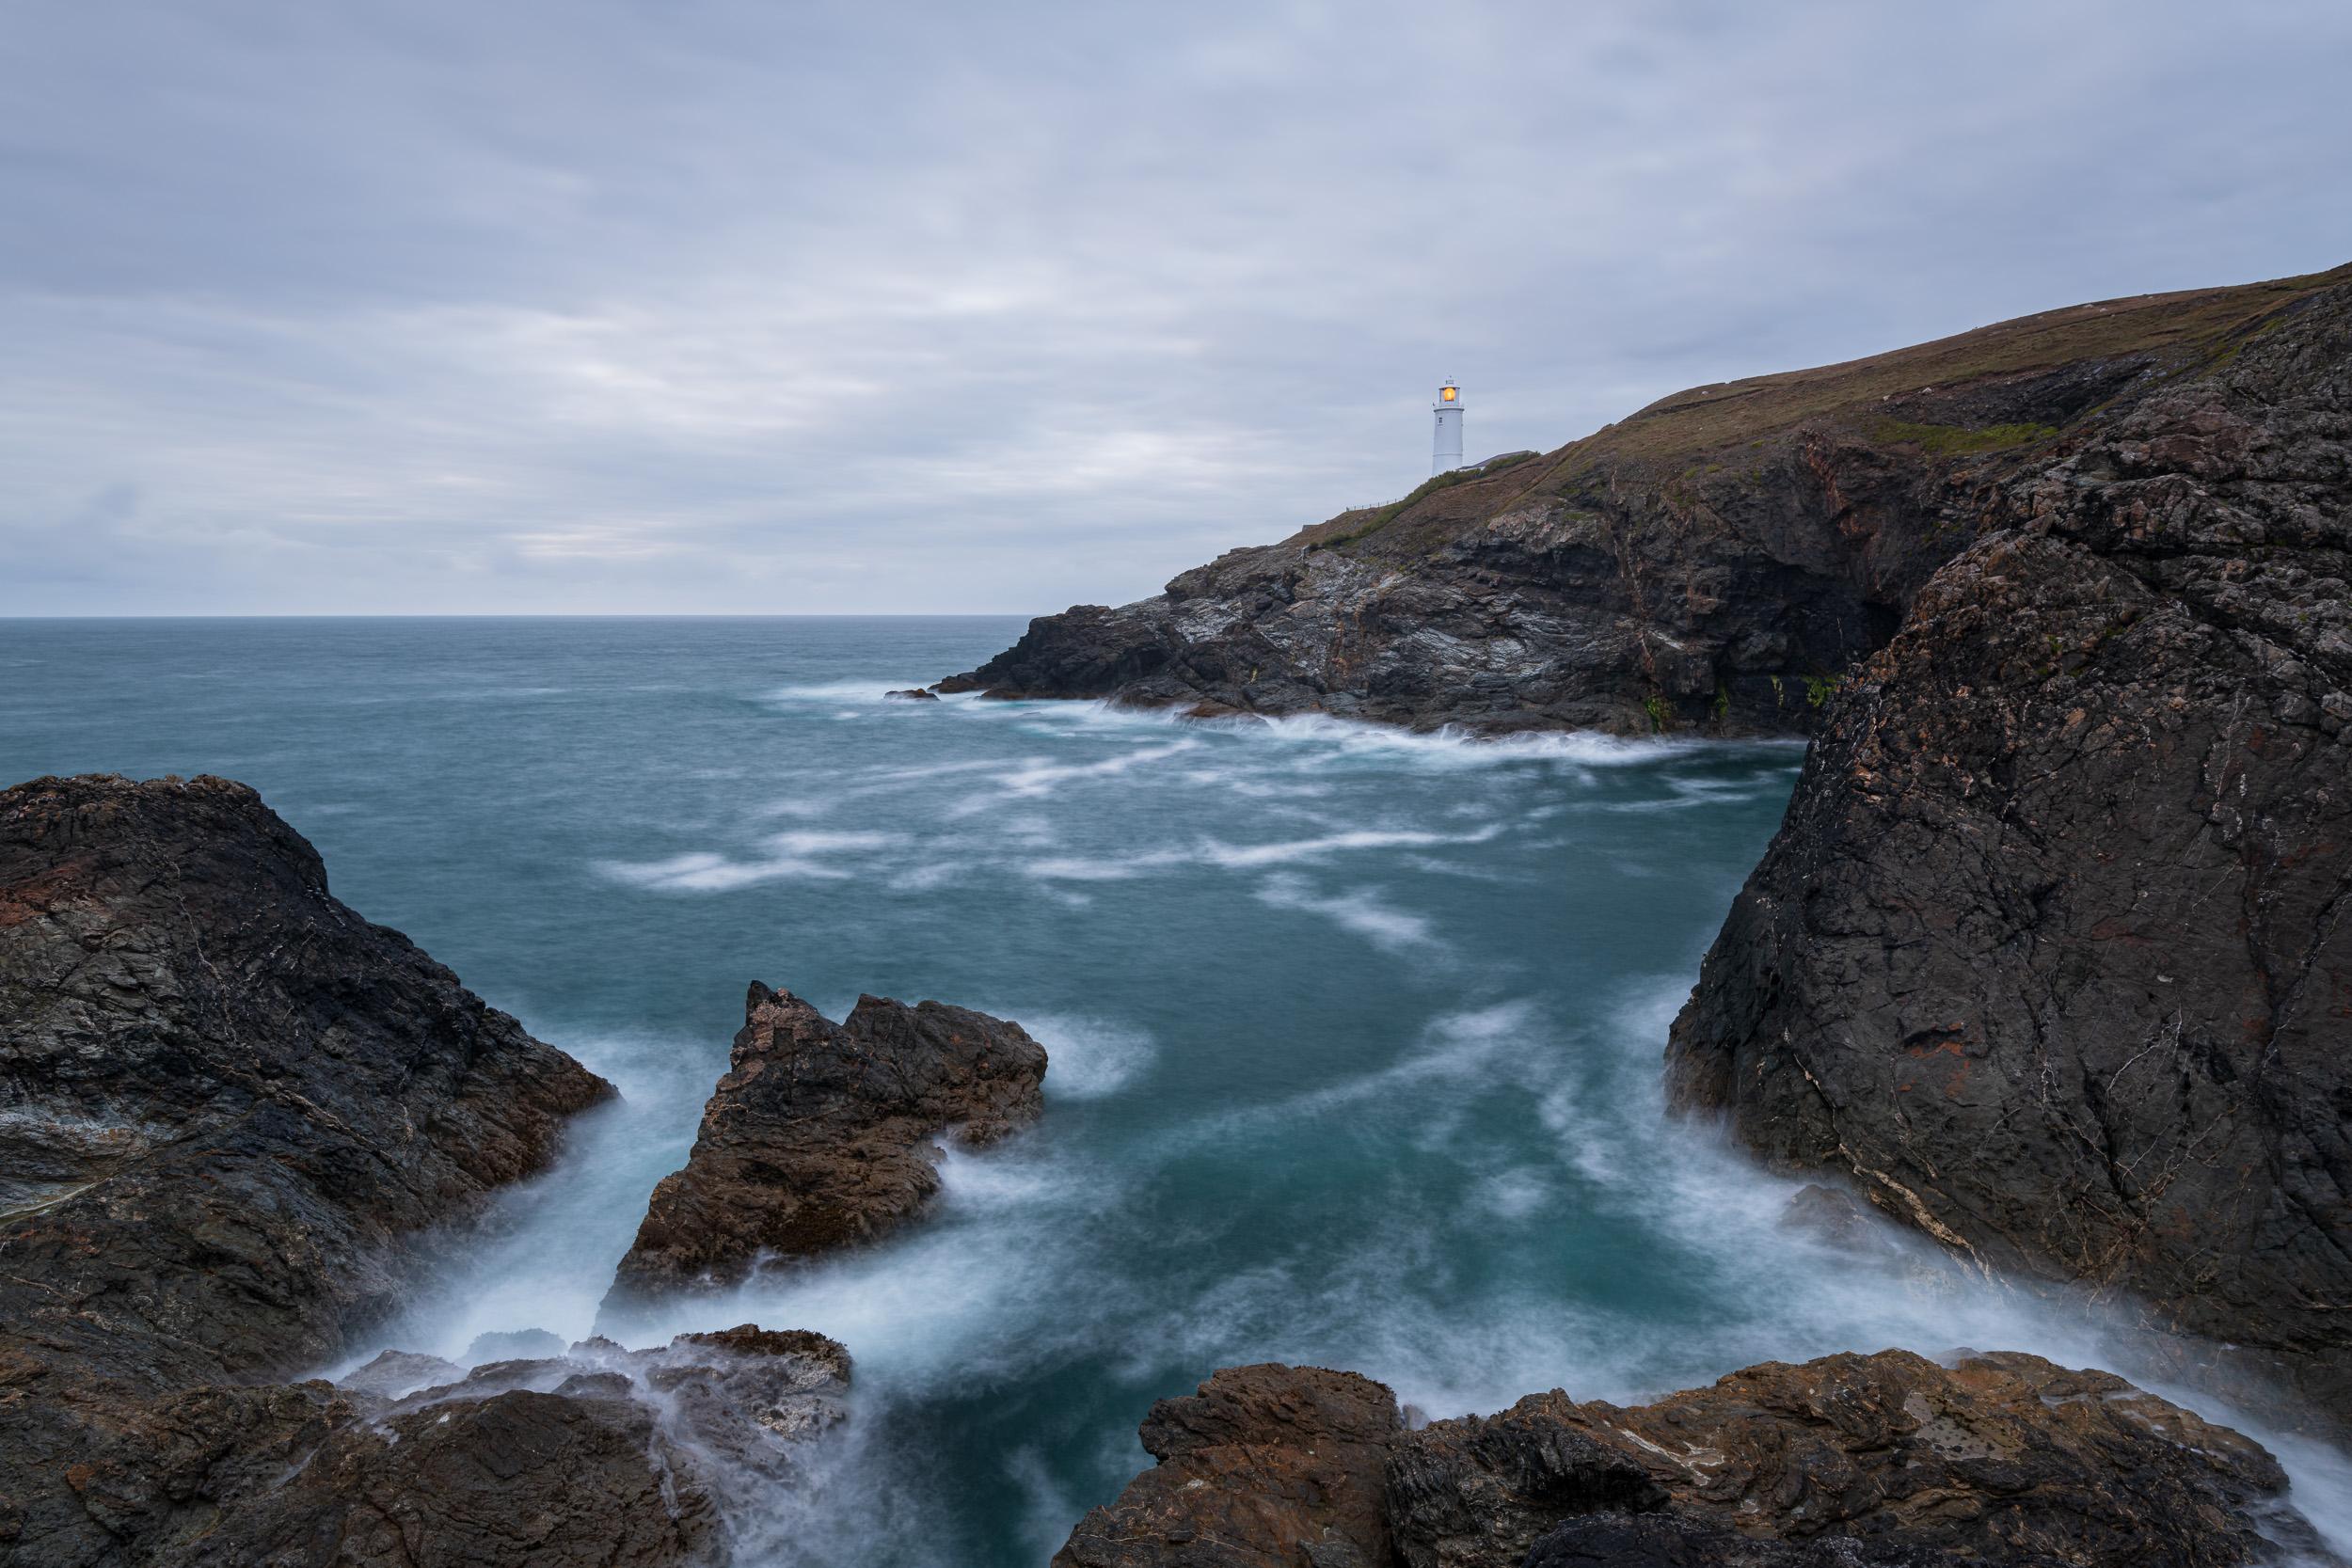 A Long Night Ahead - Trevose Head, Cornwall  - Nikon D850, Nikkor 16-35 mm f/4 at 20 mm, f/13, 13 sec at ISO 64, Kase CPL and 6 stop ND.